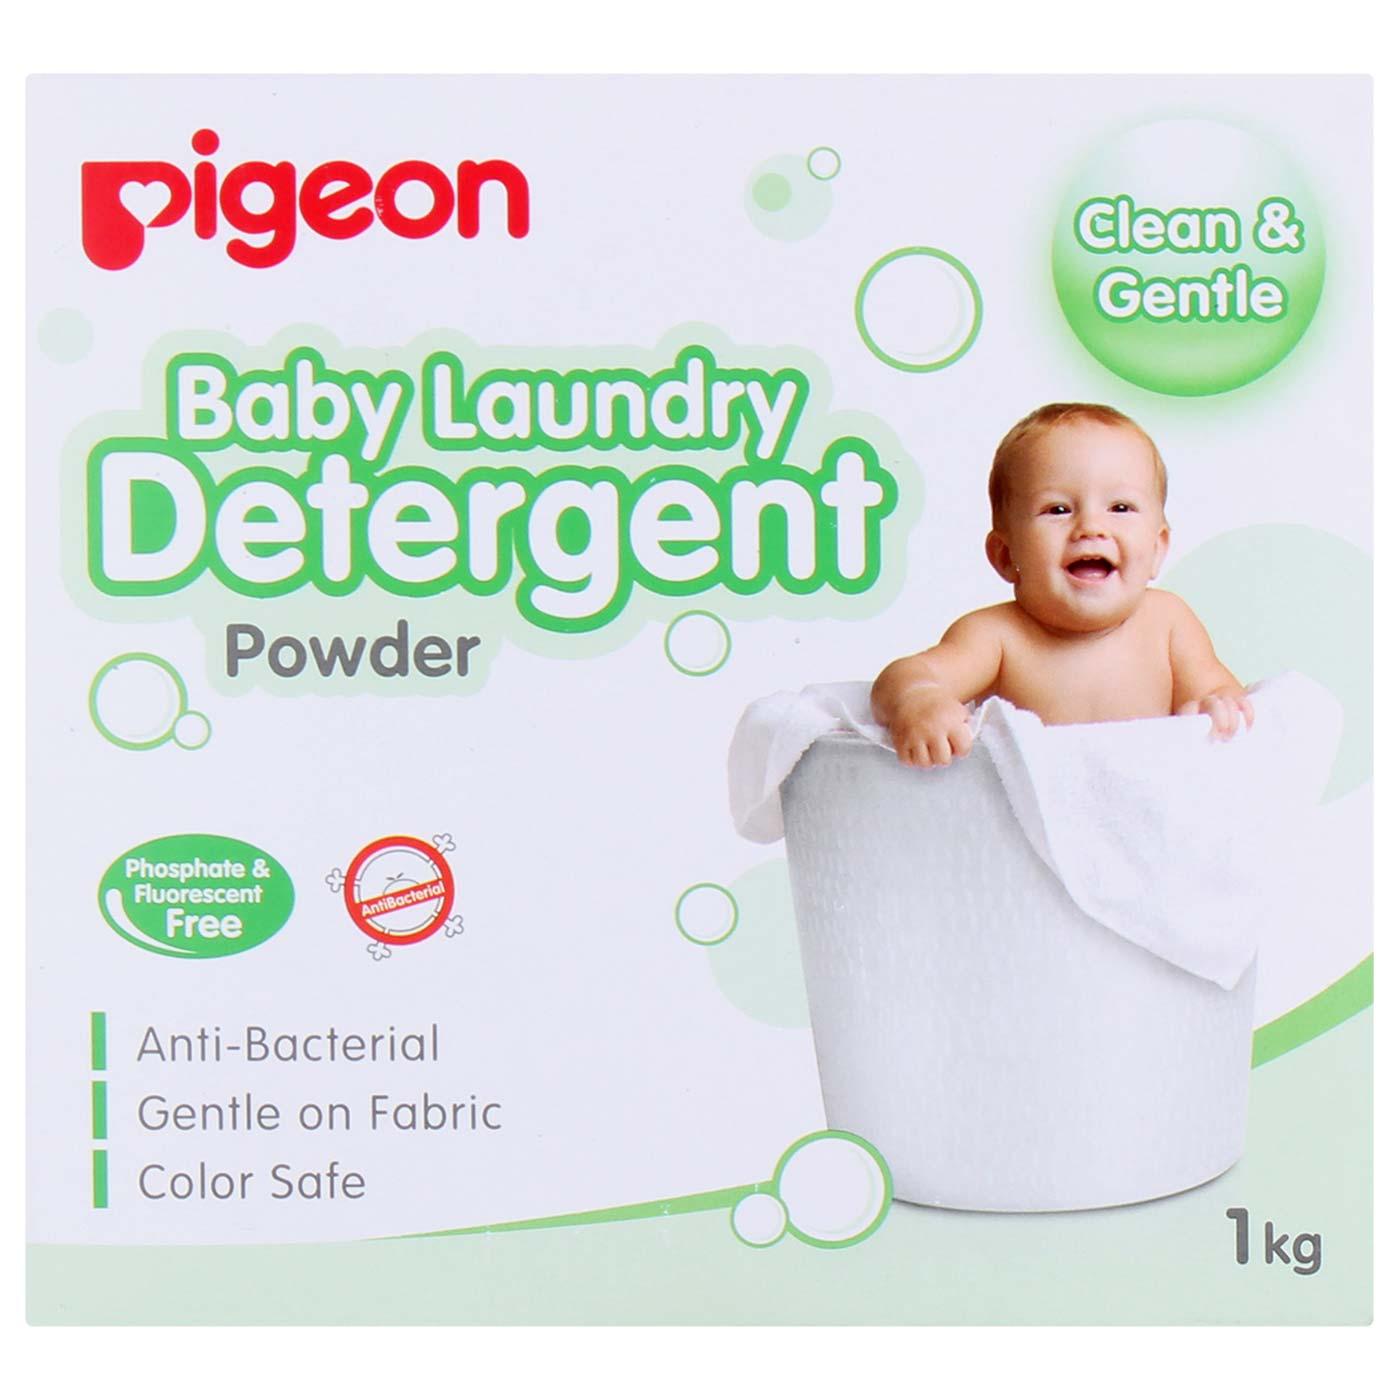 Pigeon Laundry Detergent 1kg